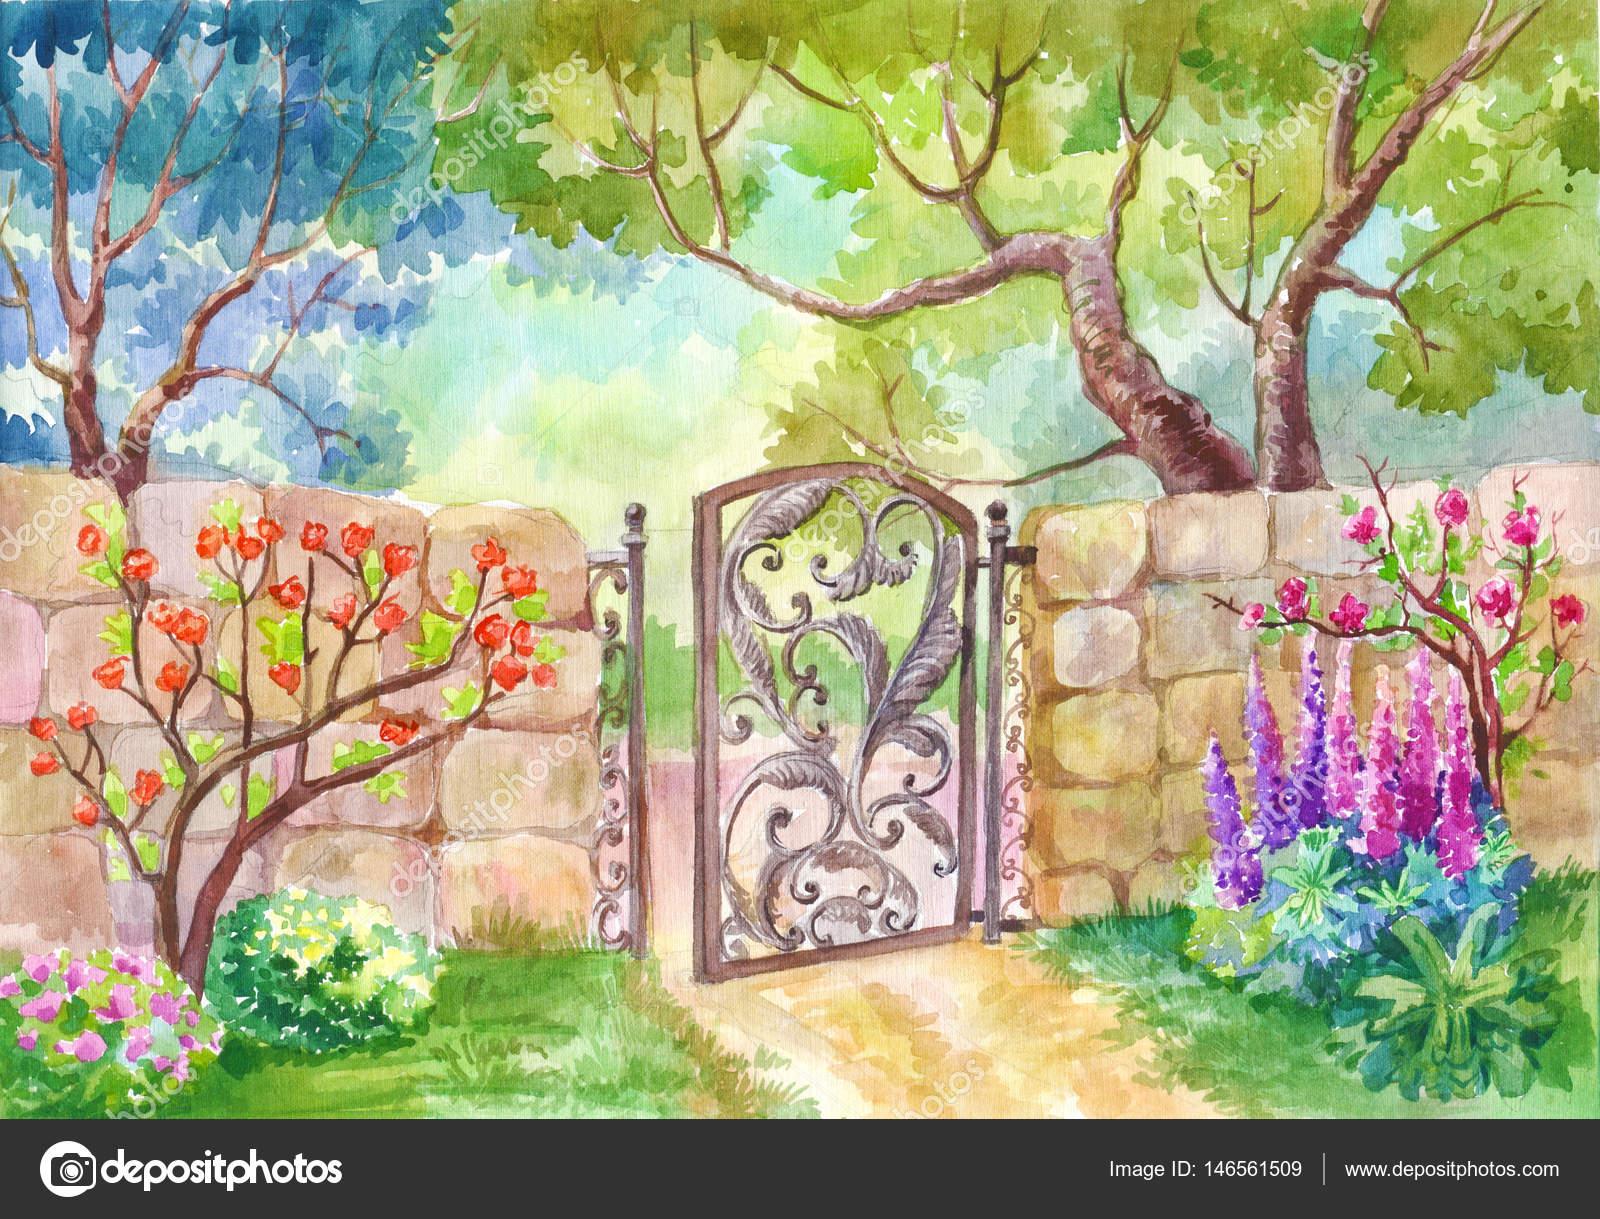 Watercolor Landscape The Gate To The Garden A Sunny Day A Gar